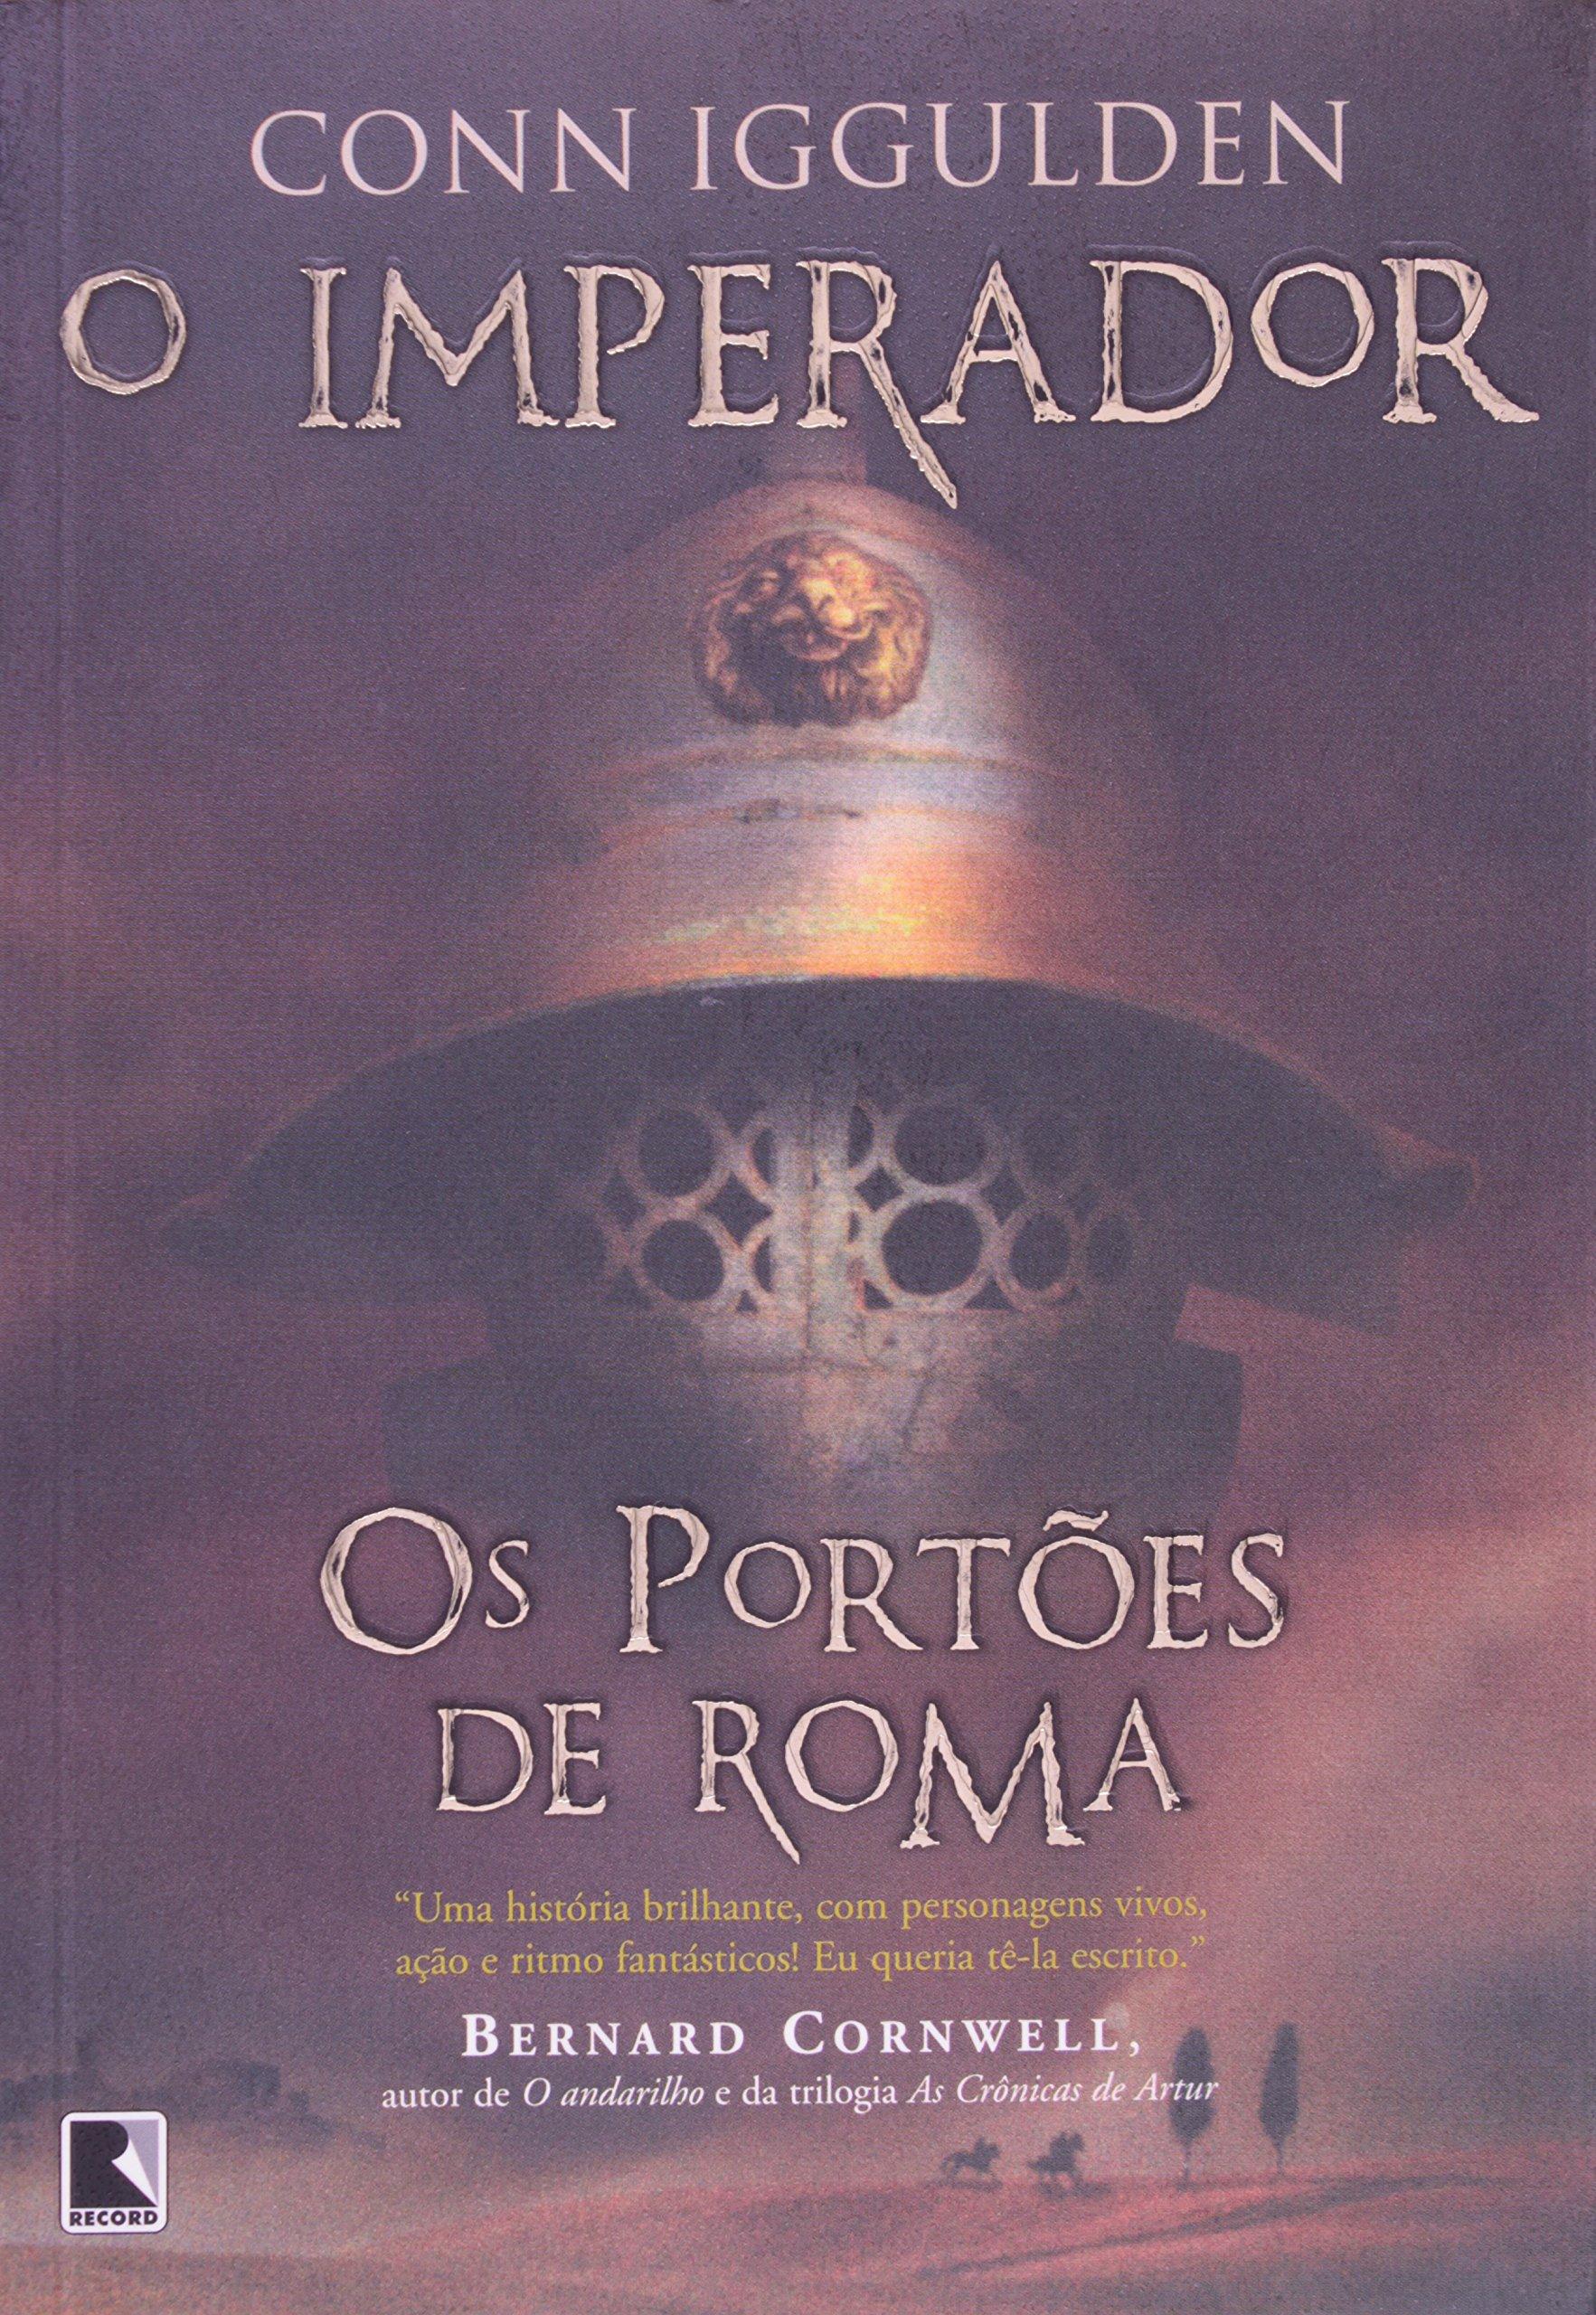 Resenha | O Imperador: Os Portões de Roma – Conn Iggulden